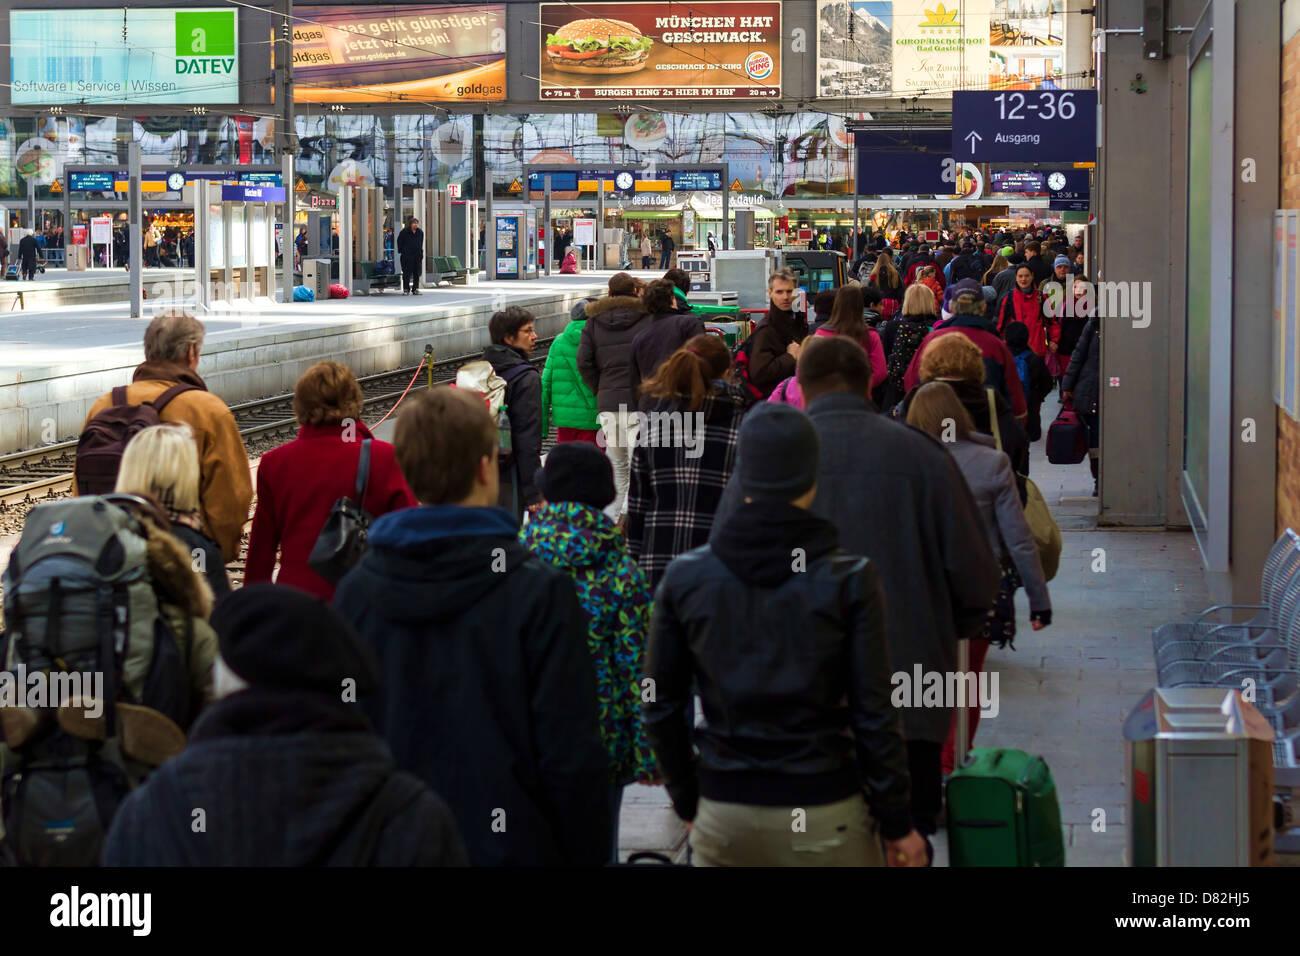 Large amount of people on the train platform at Hauptbahnhof Mainstation, Railway Station, Munich Germany - Stock Image